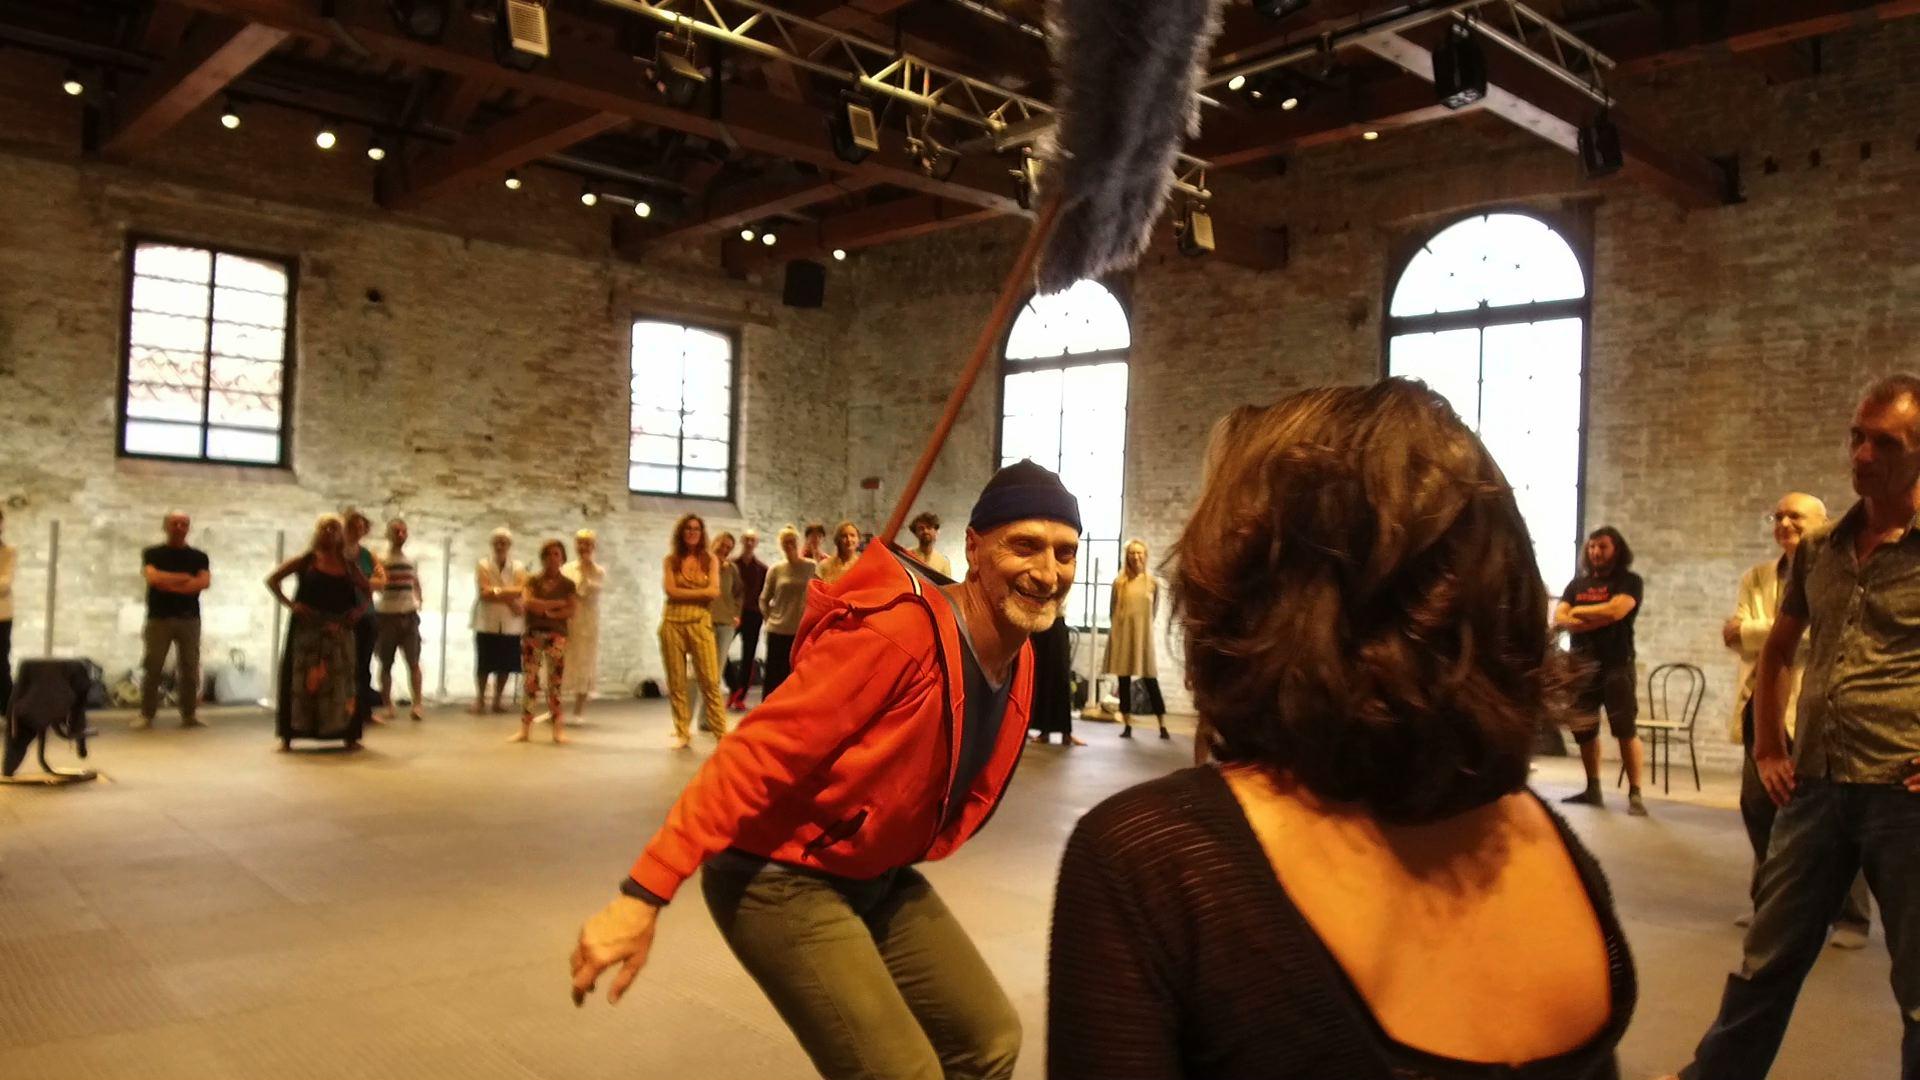 Benoît Lachambre, Lifeguard, Biennale Danza 2017, Sale d'armi dell'Arsenale, Venezia